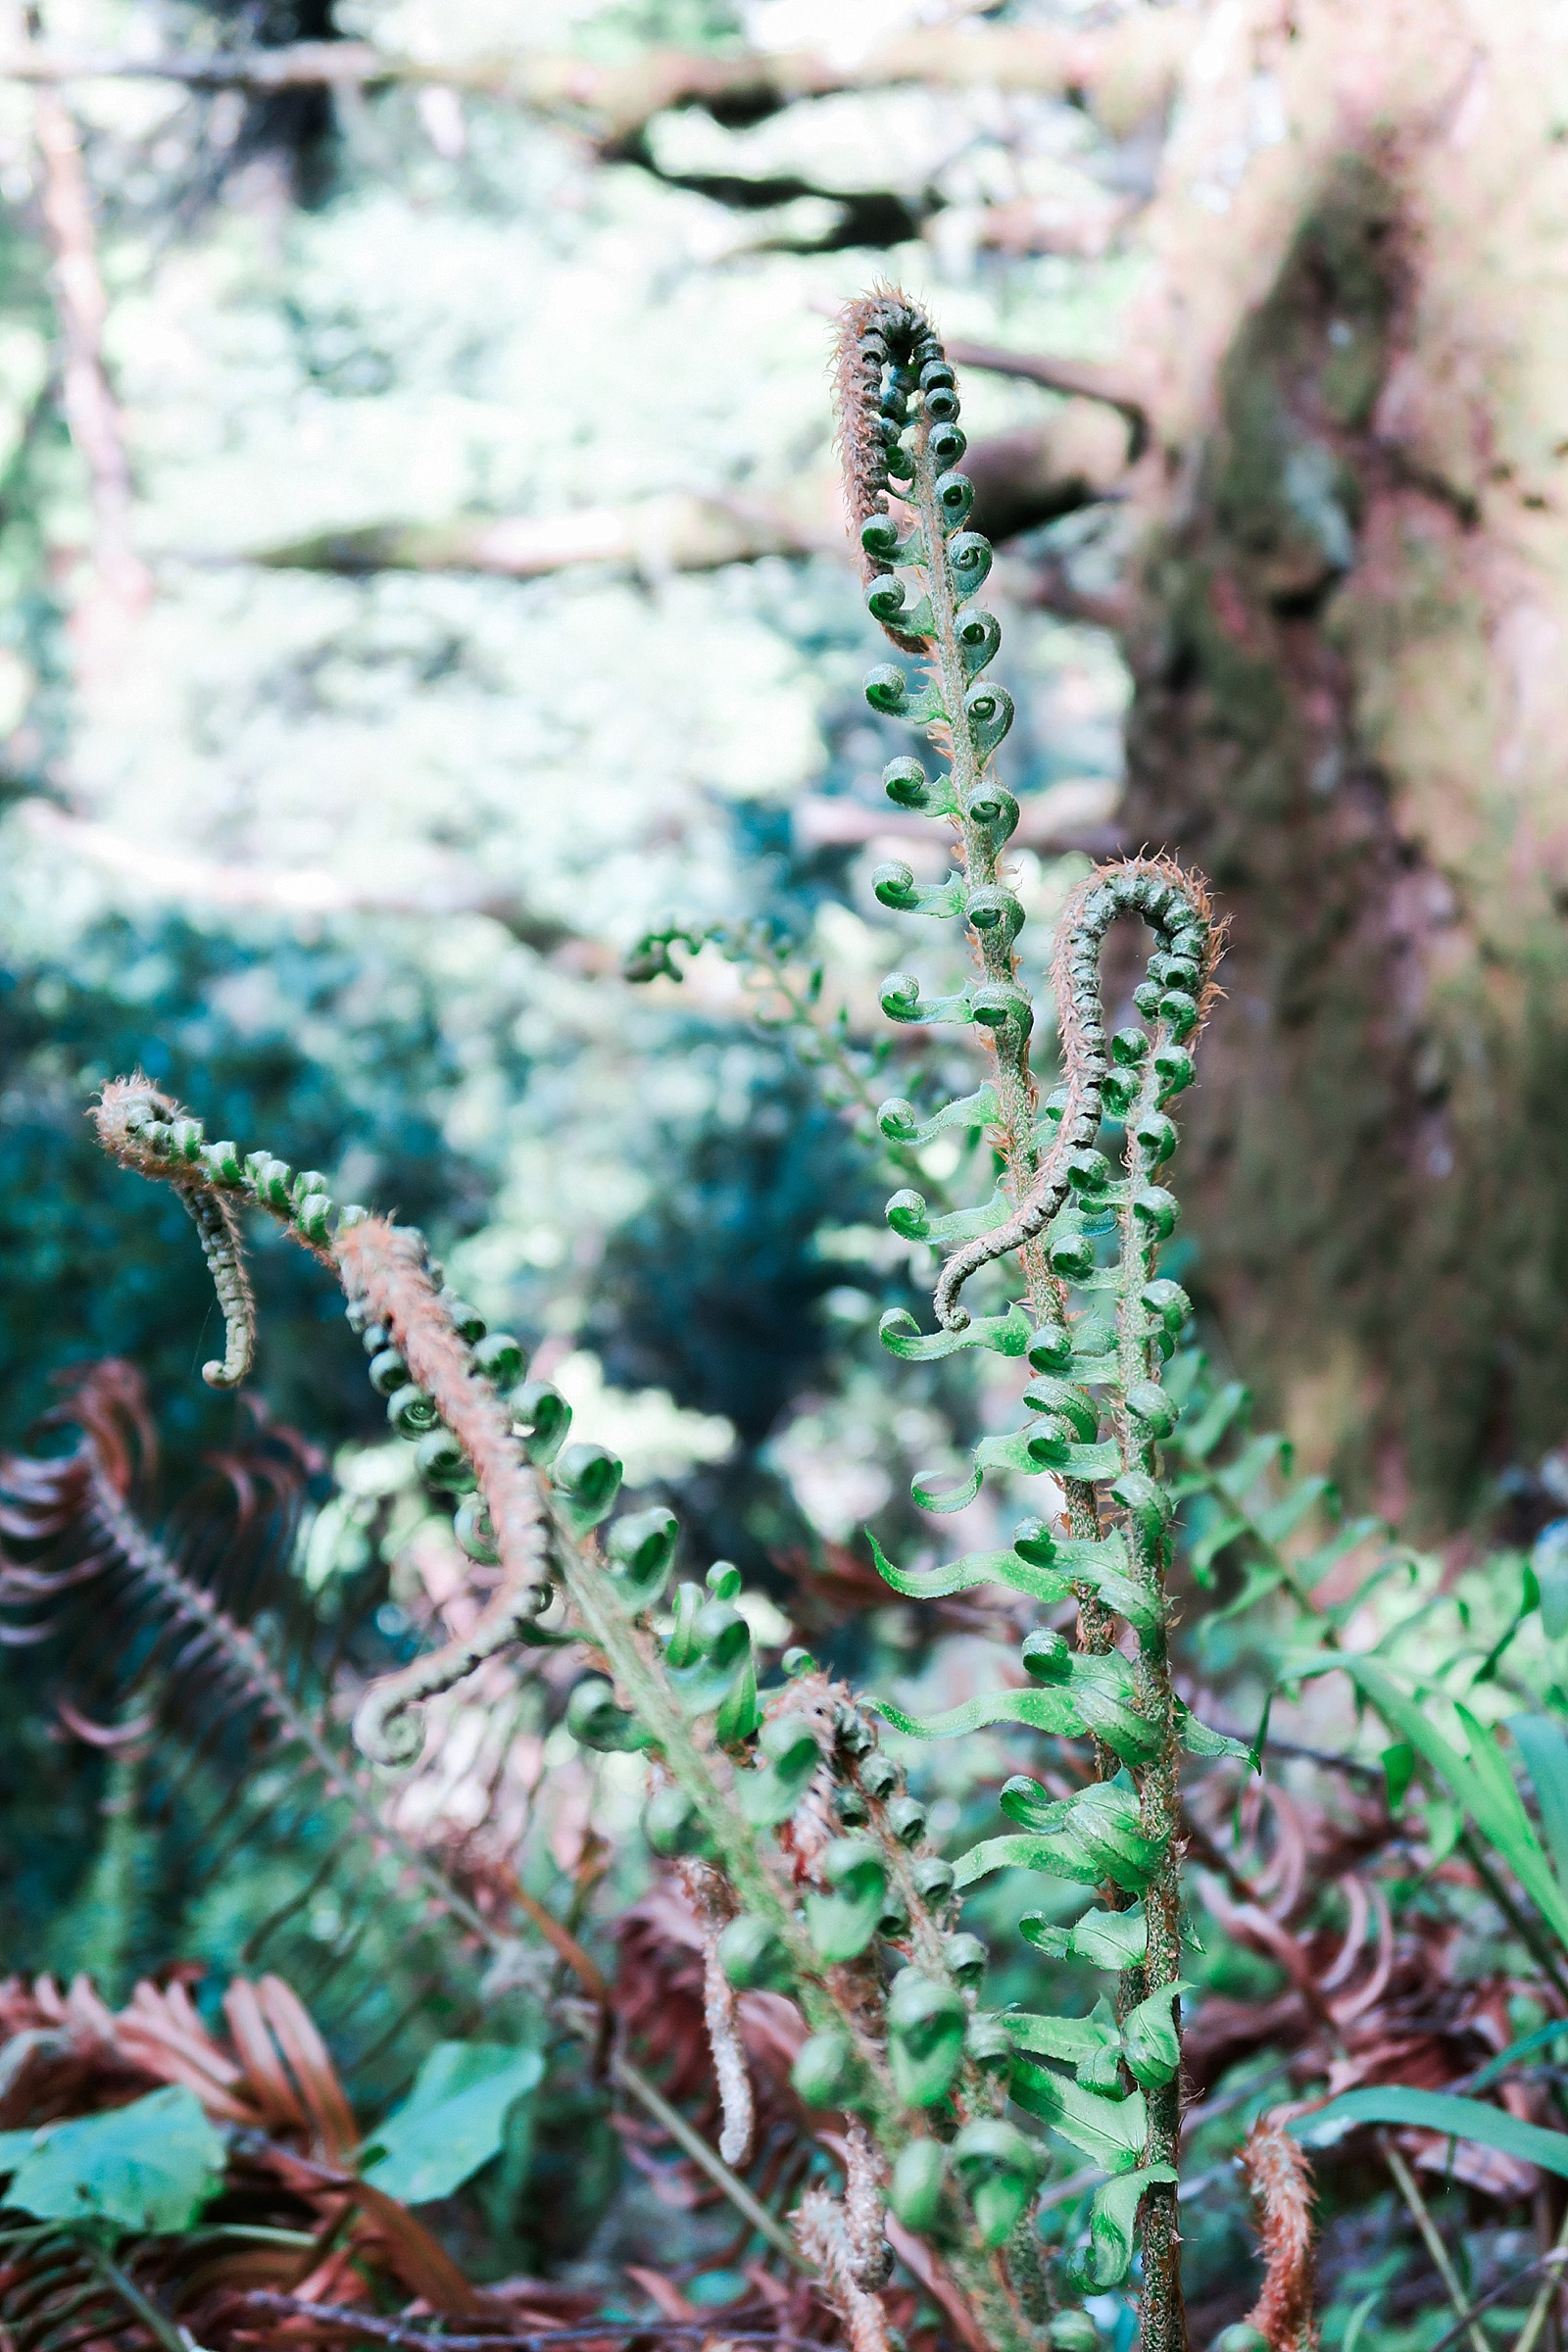 diana-elizabeth-blog-lifestyle-scotts-seed-sun-shade-lawn-games-setup-tutorial-0212